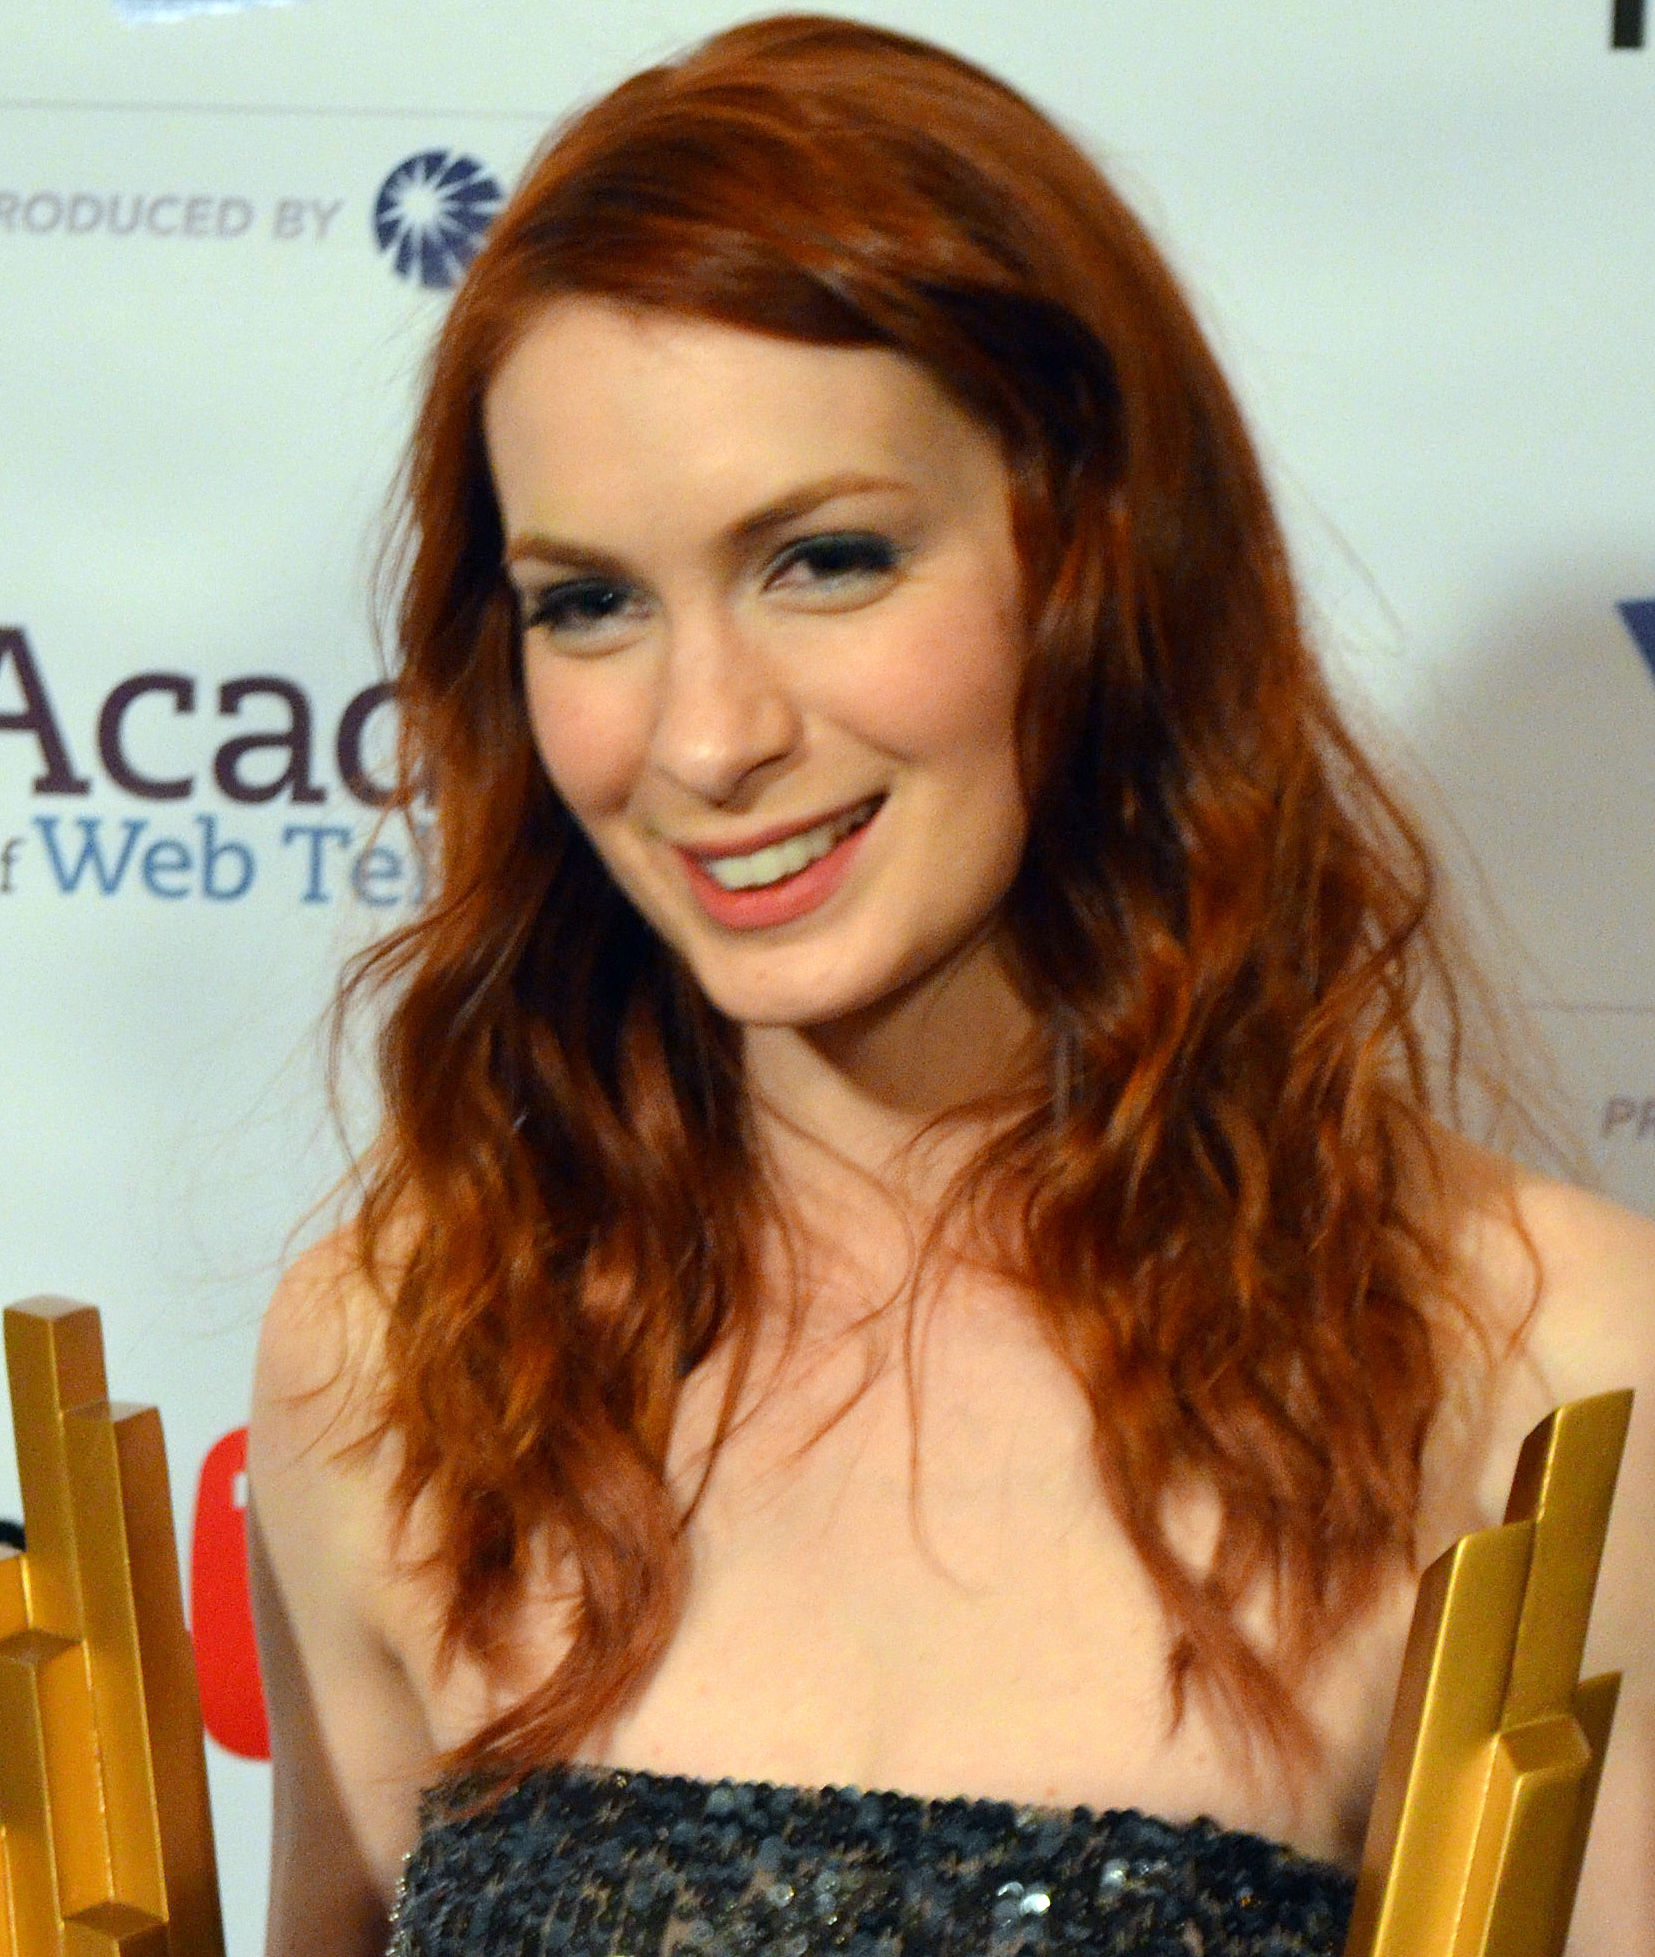 Photo of Felicia Day: American actress